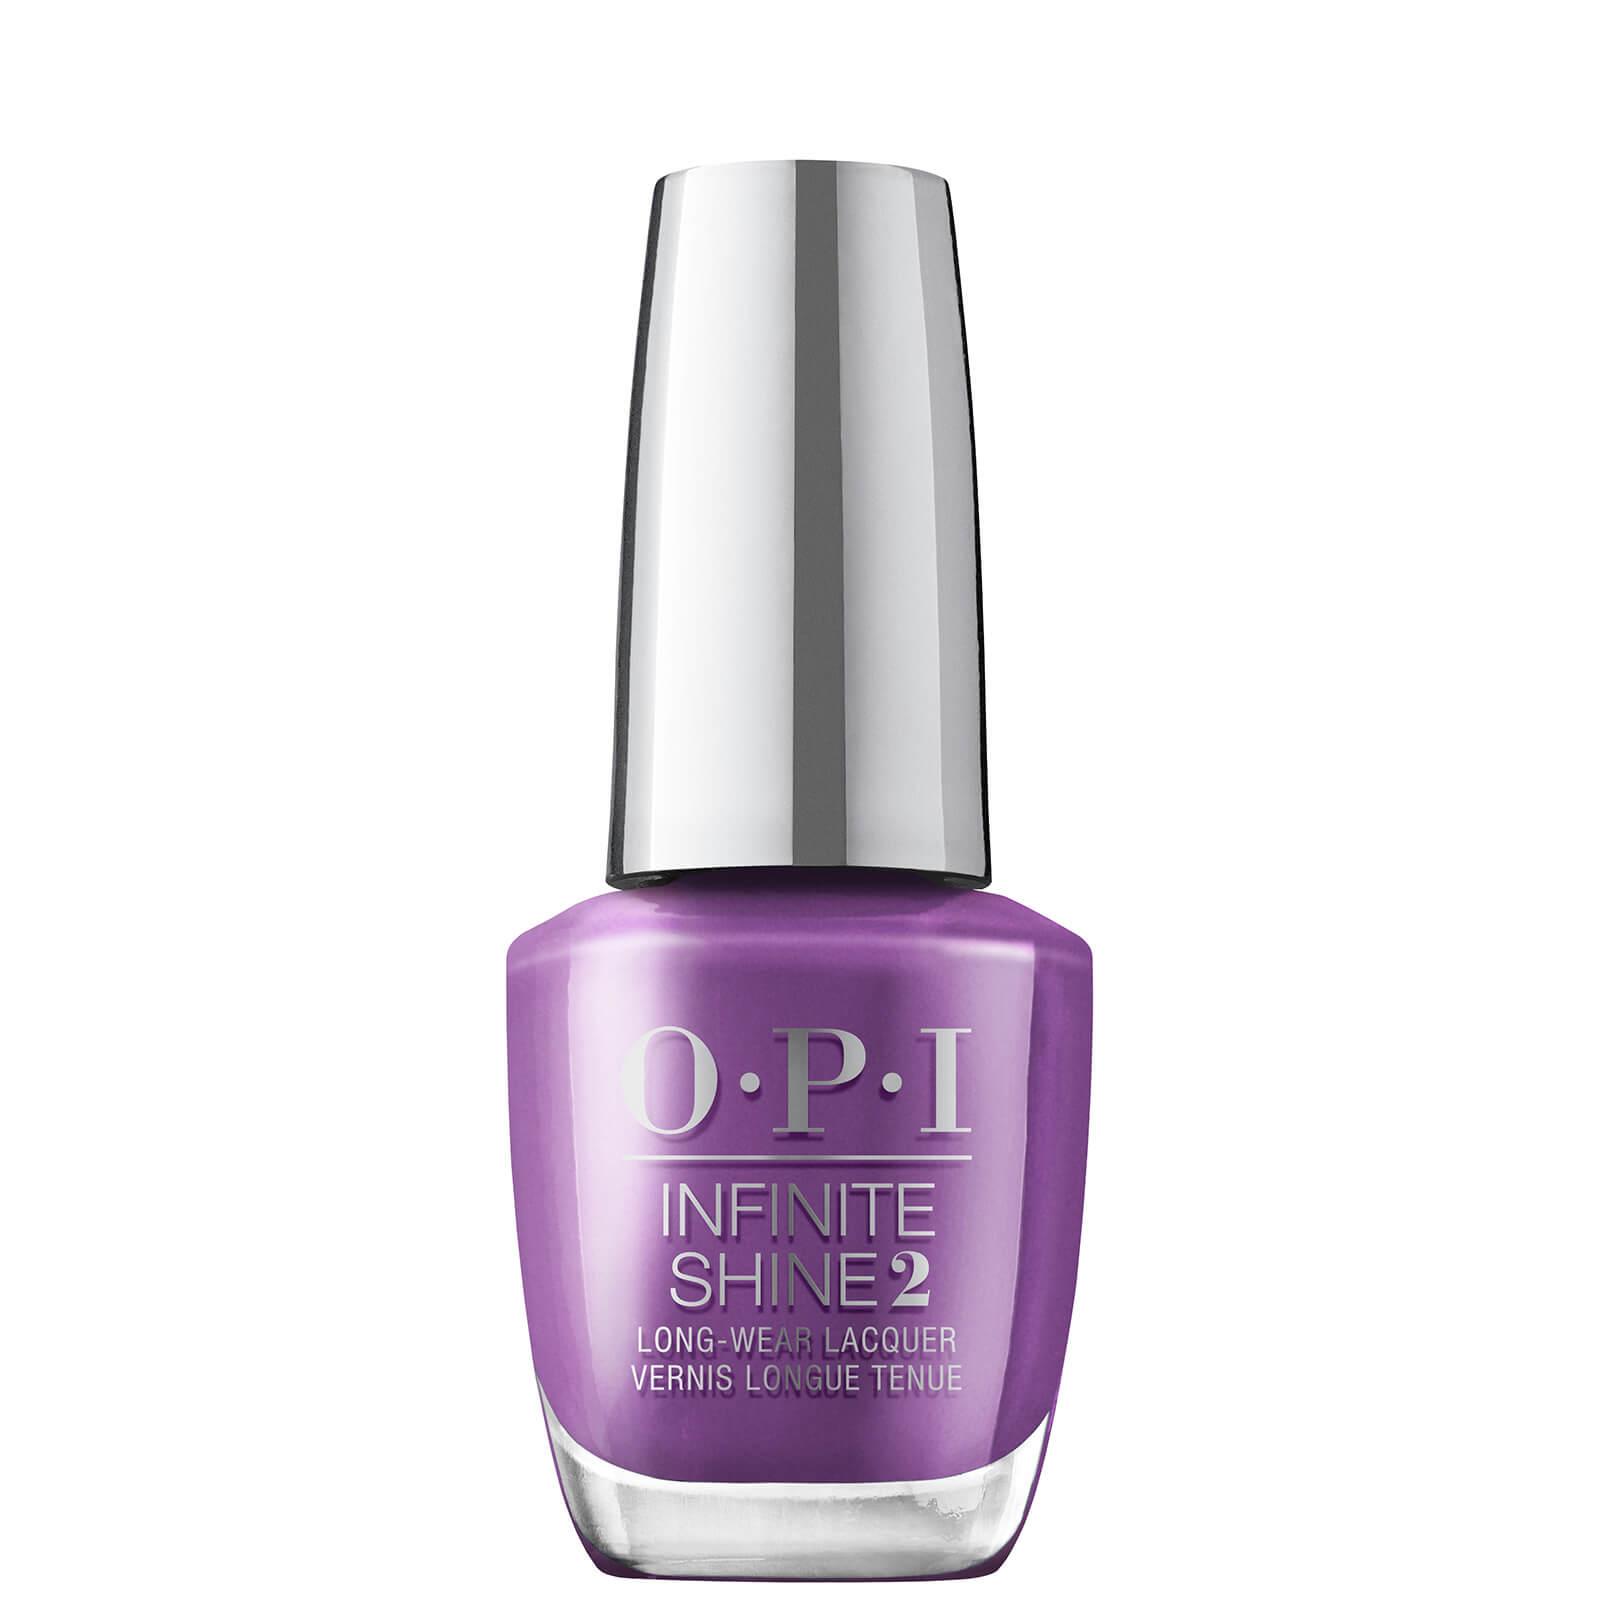 Купить OPI DTLA Collection Infinite Shine Long-wear Nail Polish 15ml (Various Shades) - Violet Visionary